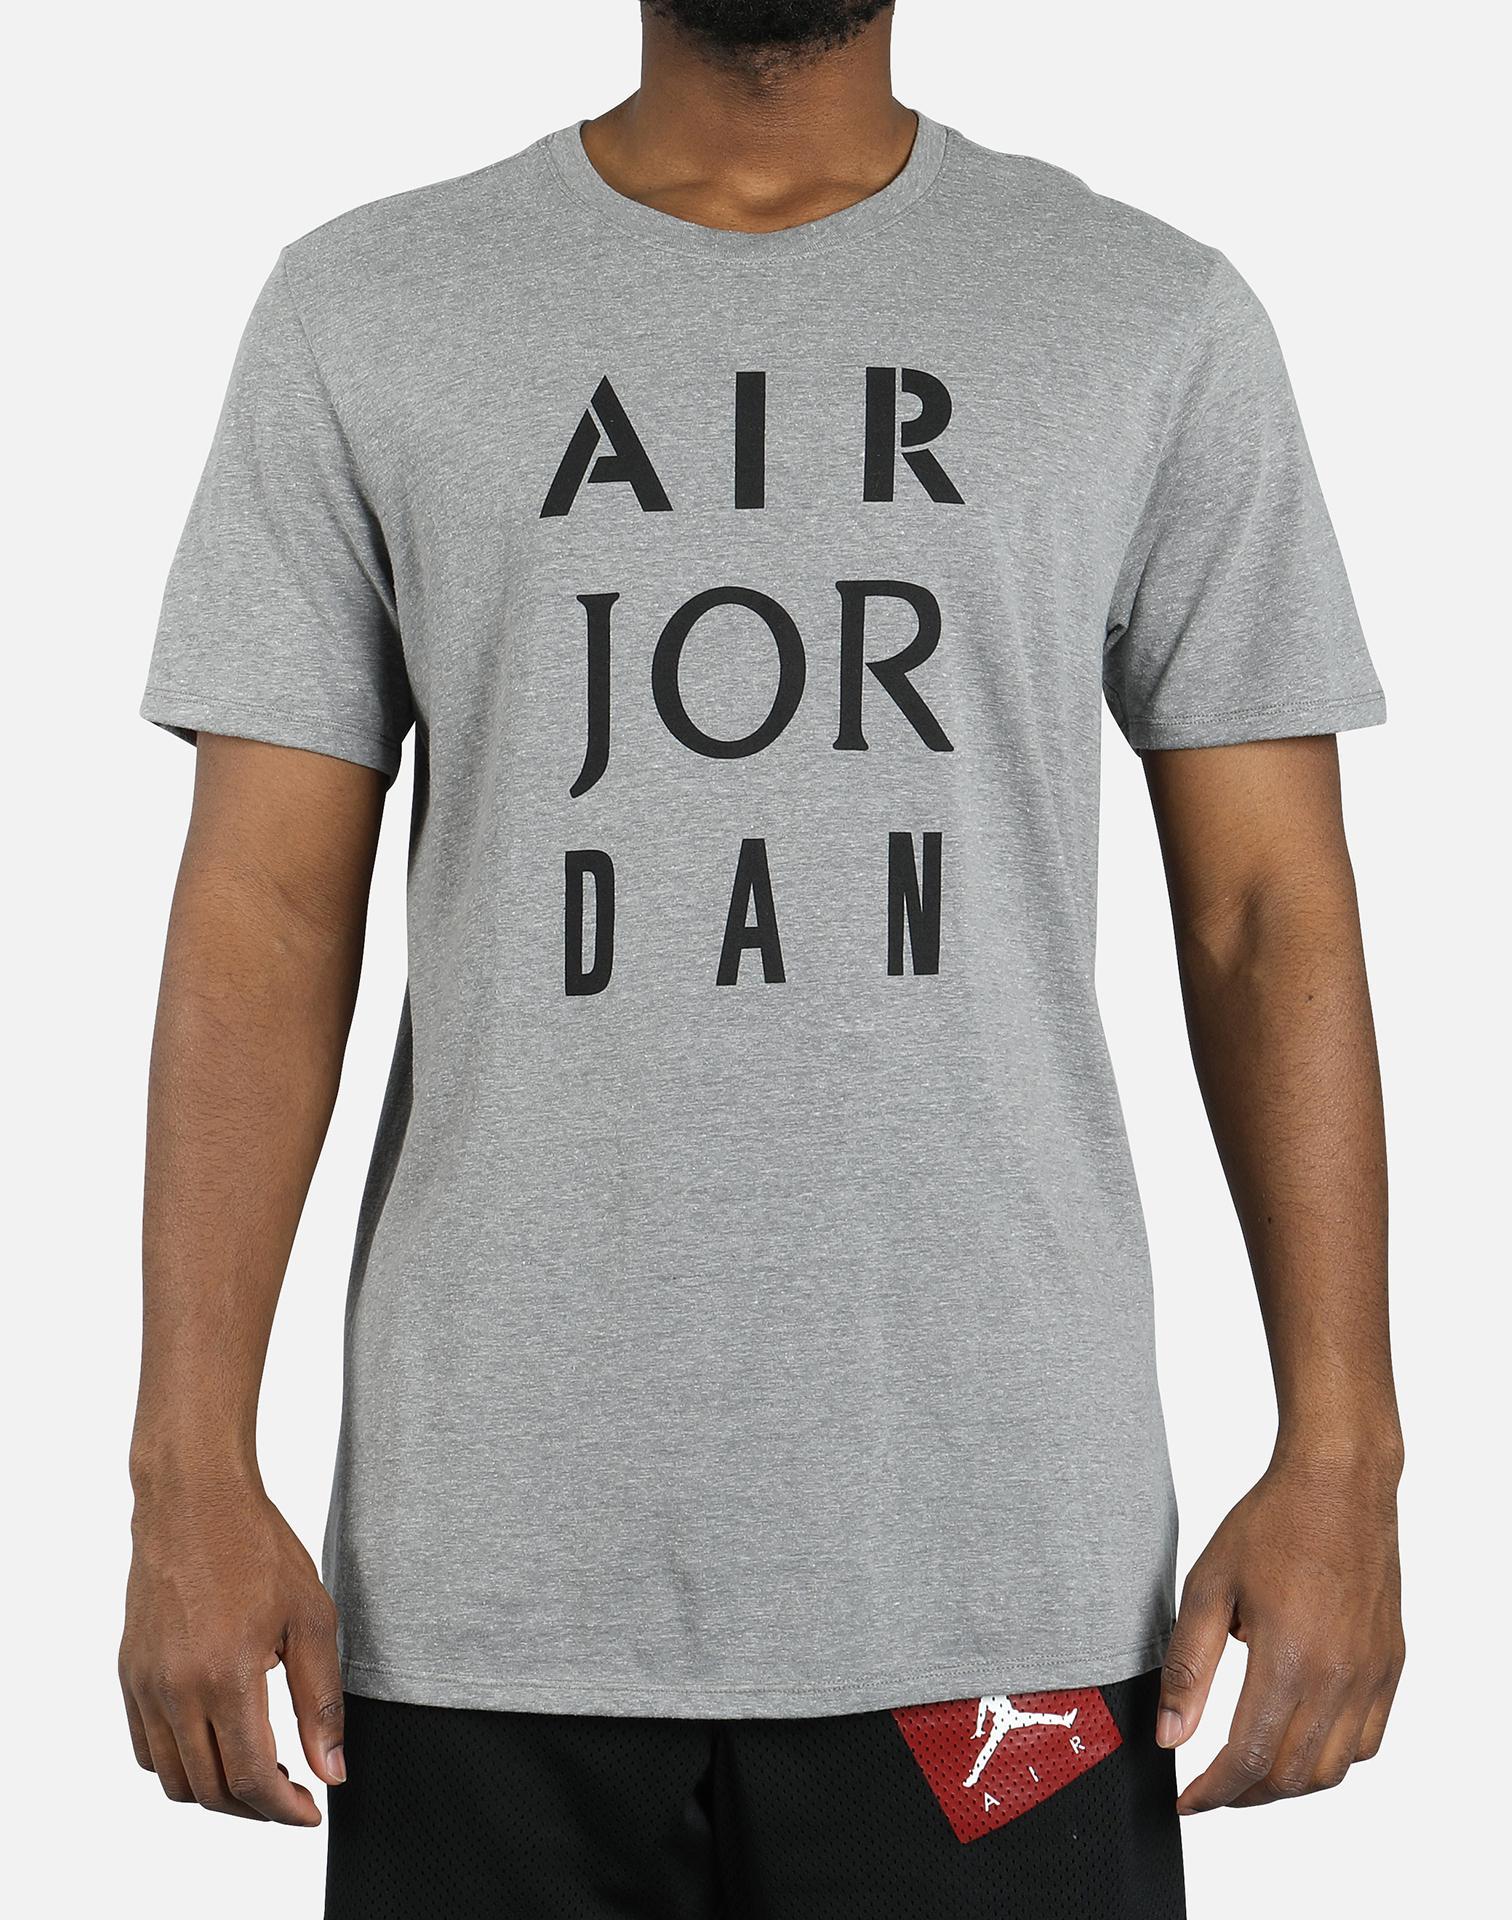 29a8b68ff14 Lyst - Nike Jsw Hbr Air Stencil Tee in Gray for Men